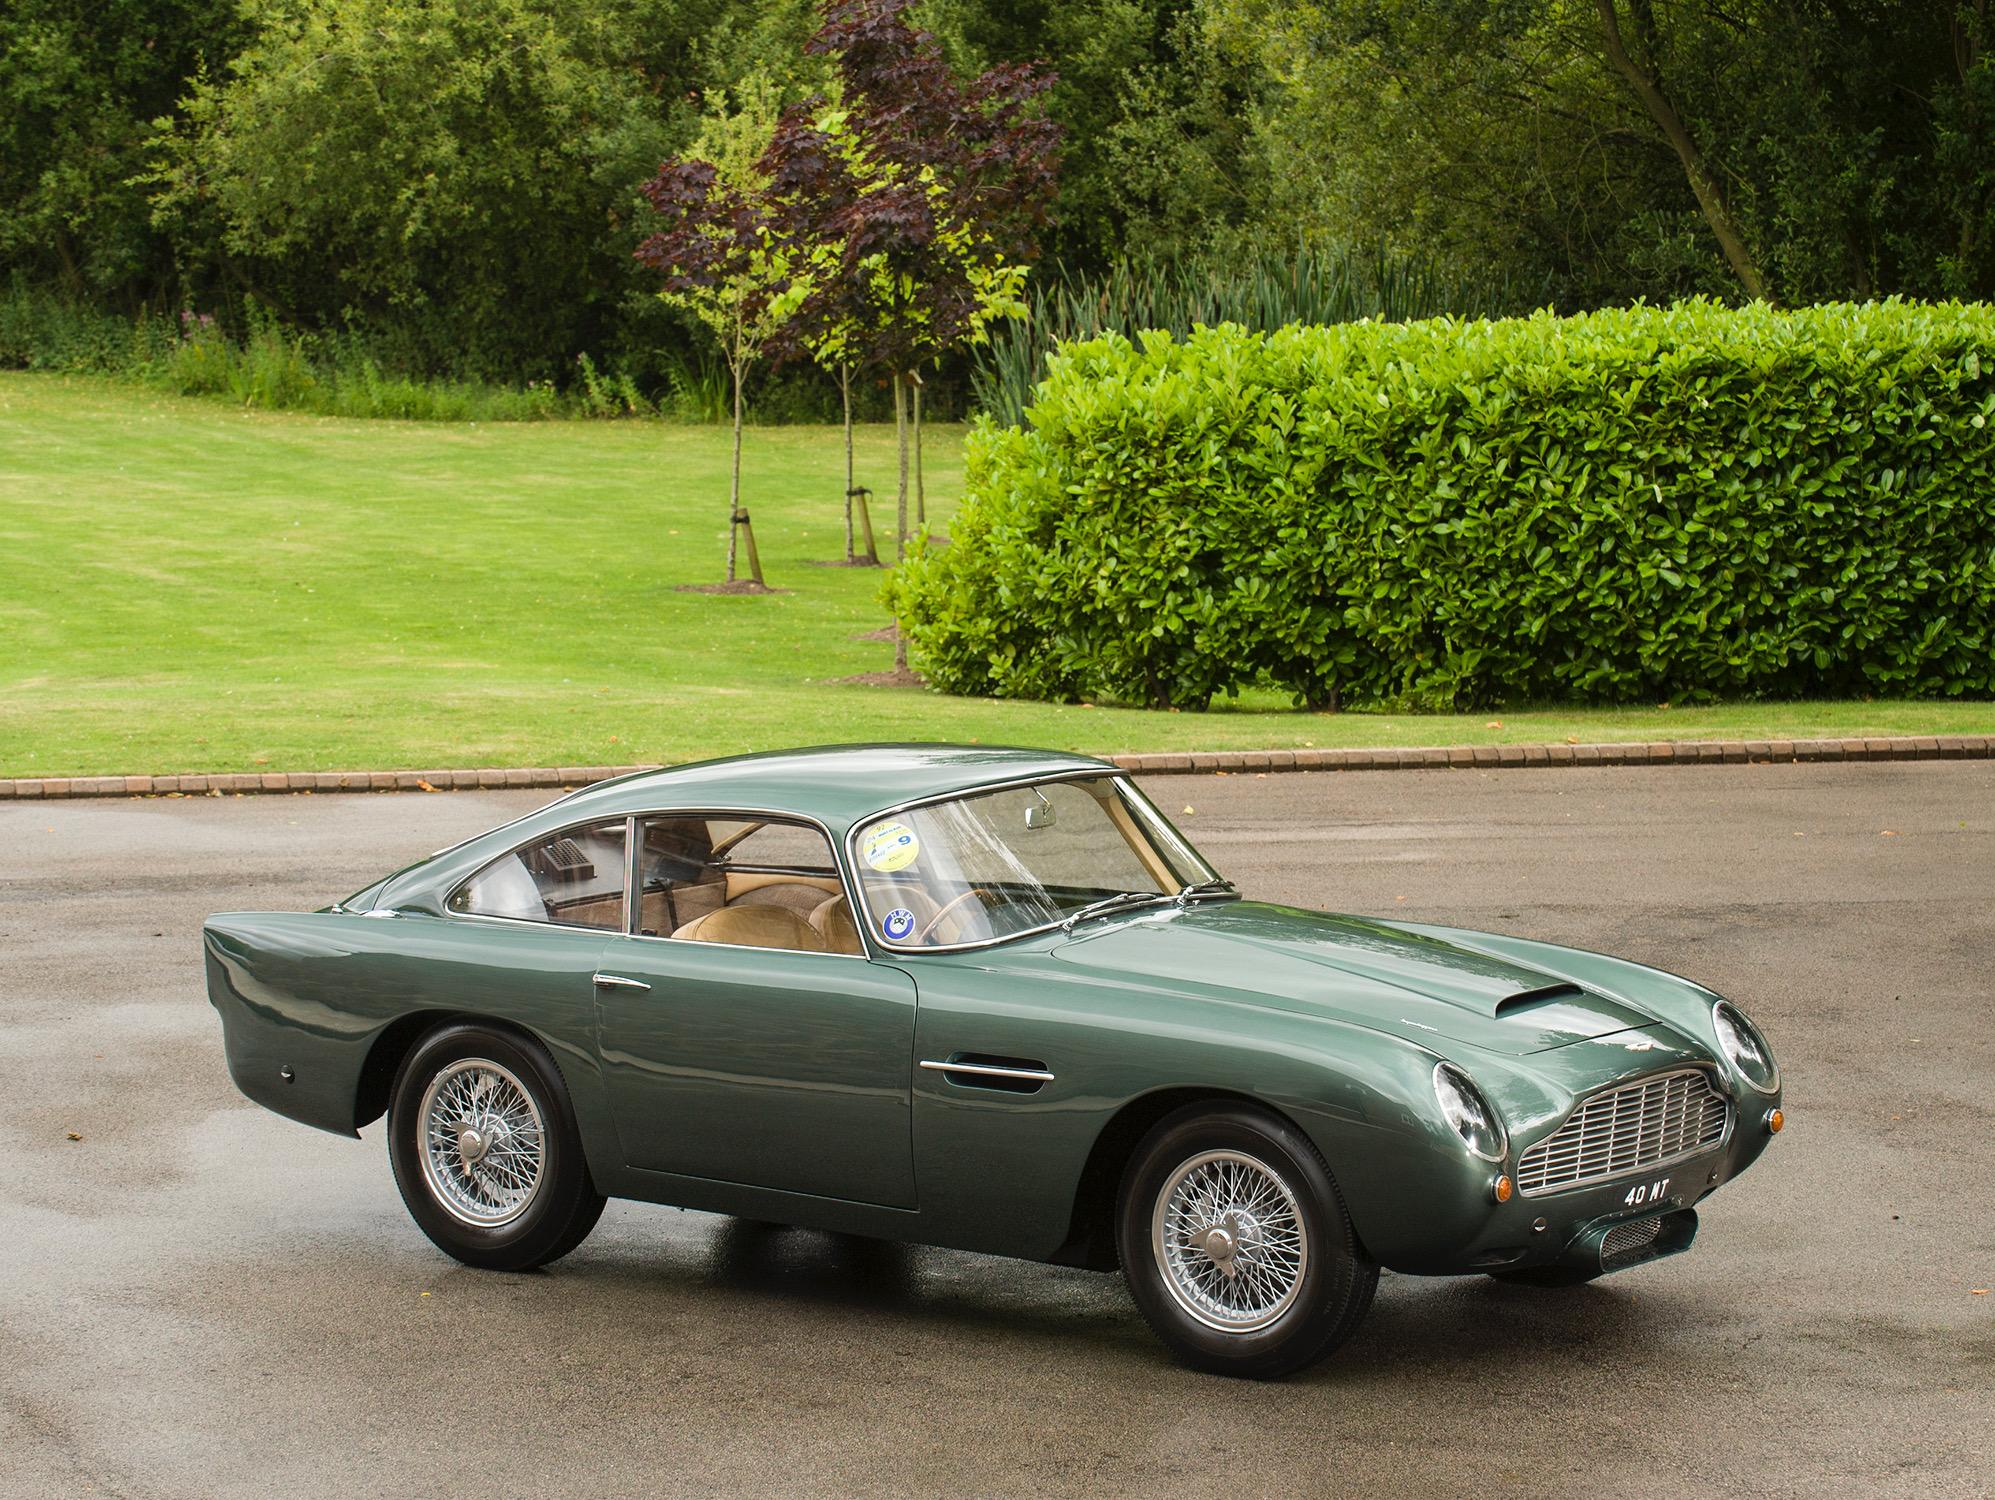 Aston Martin Db4 Gt Leichtgewicht 0167 R Tom Hartley Jnr